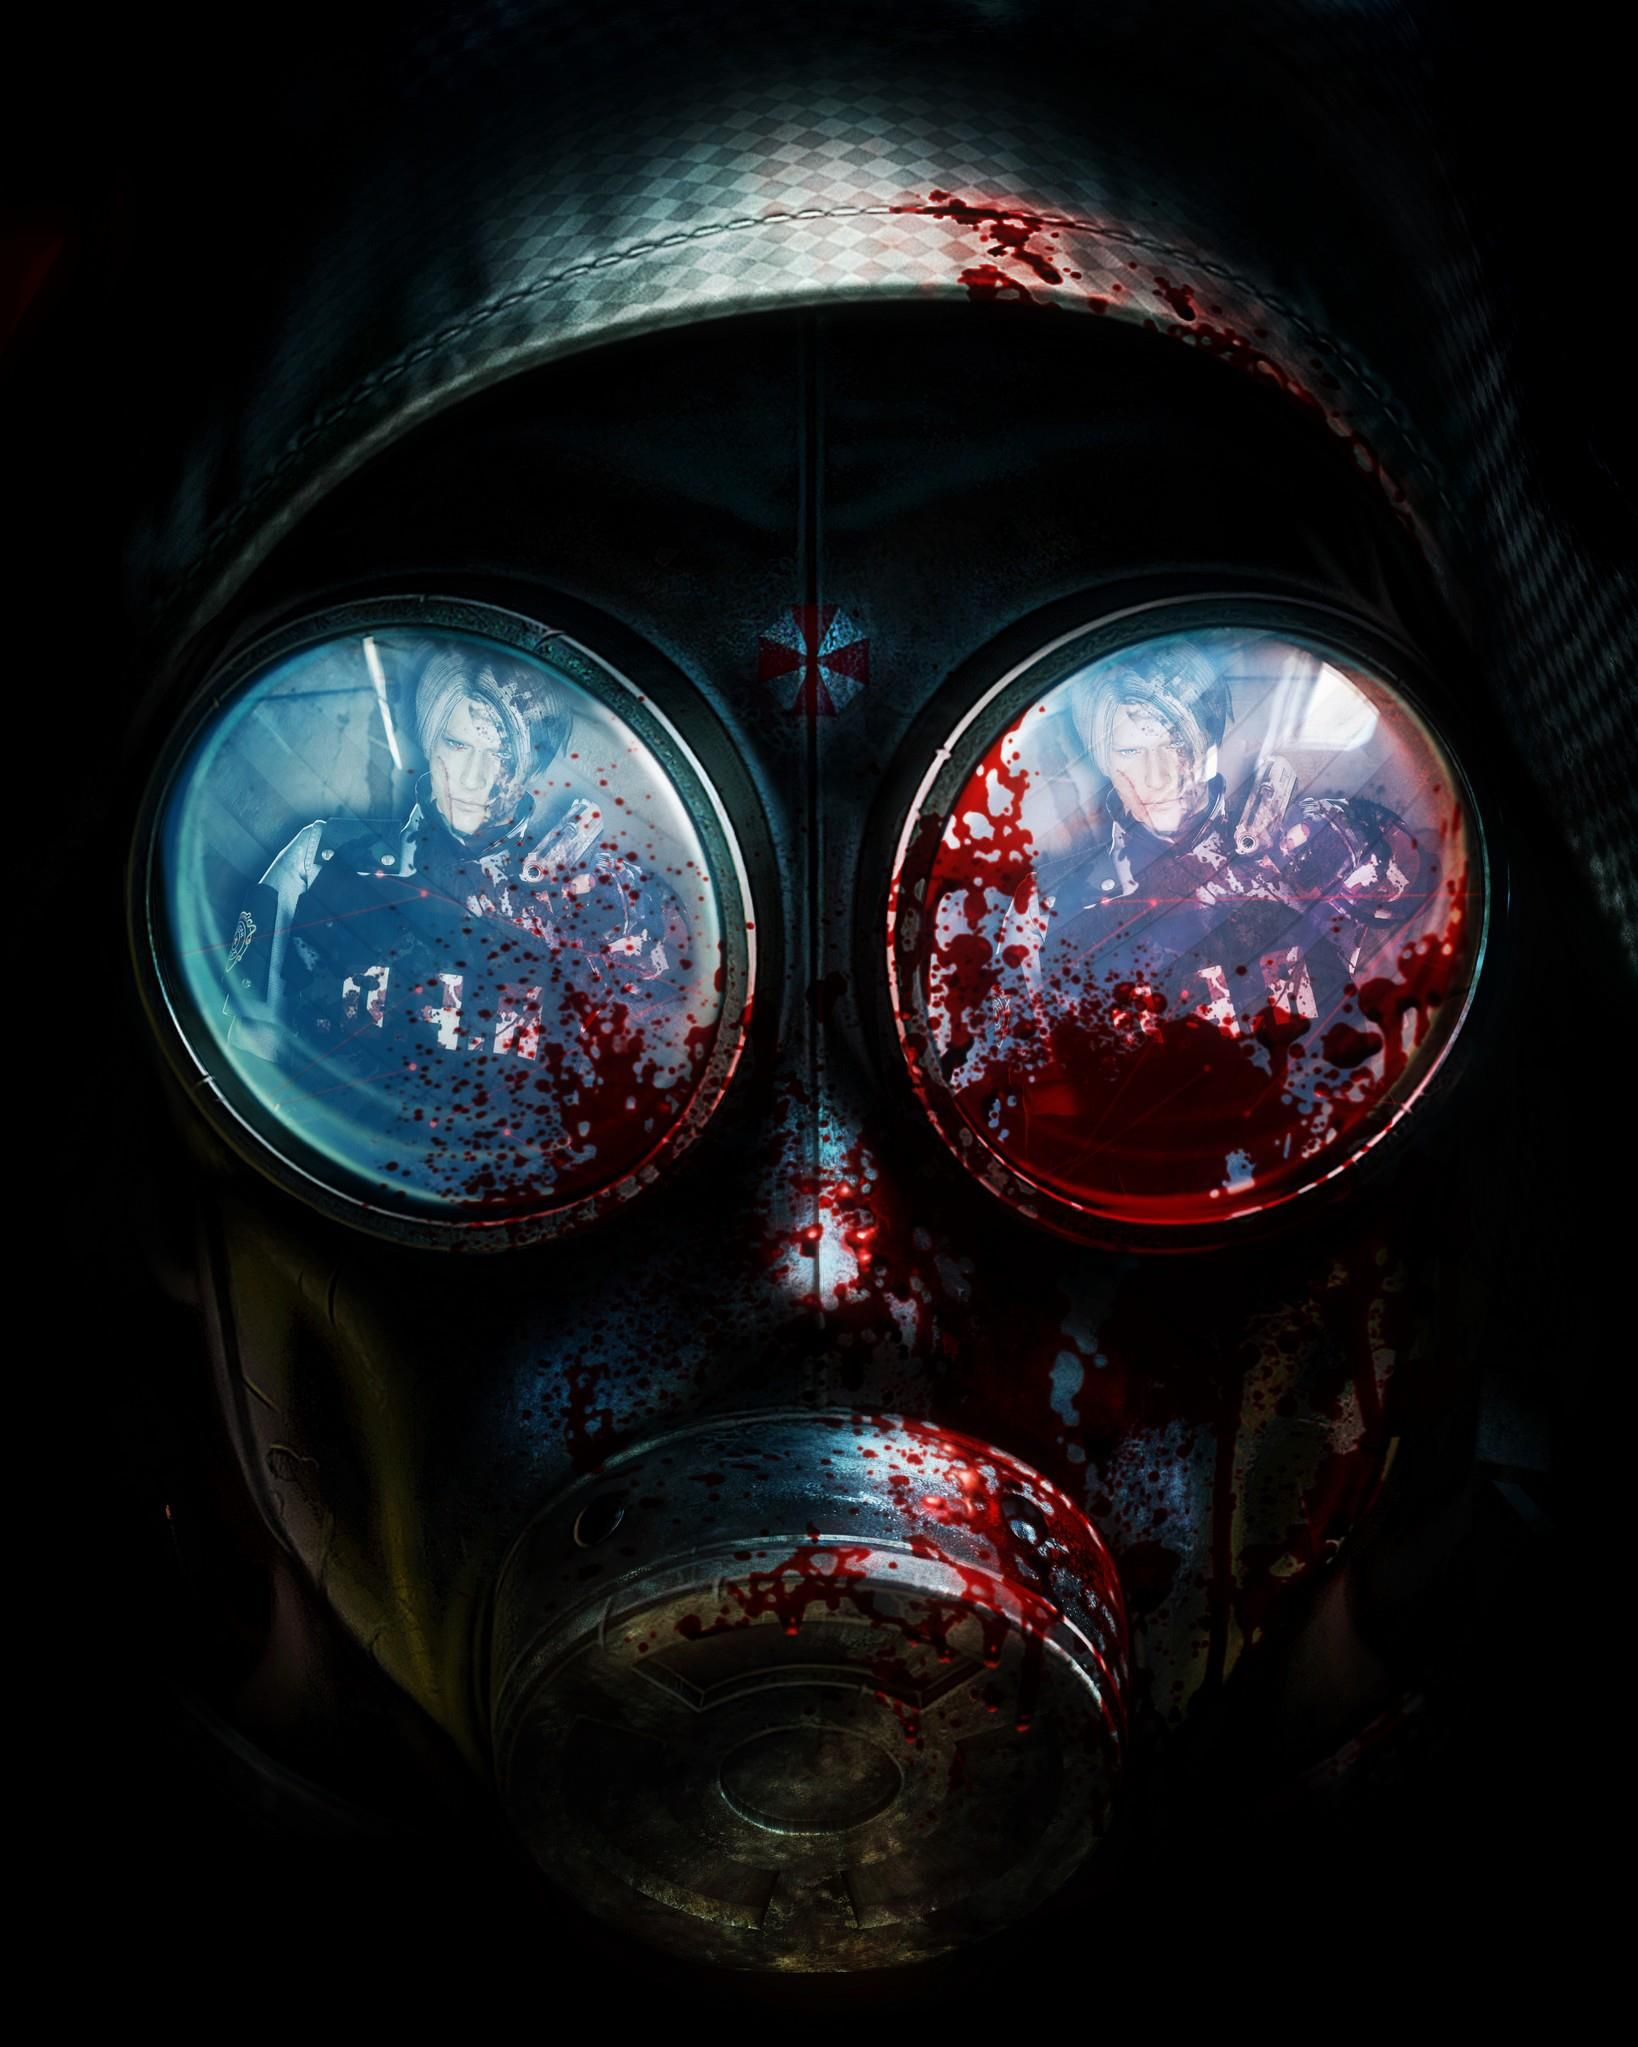 Resident Evil, Imagenes De Venom Y